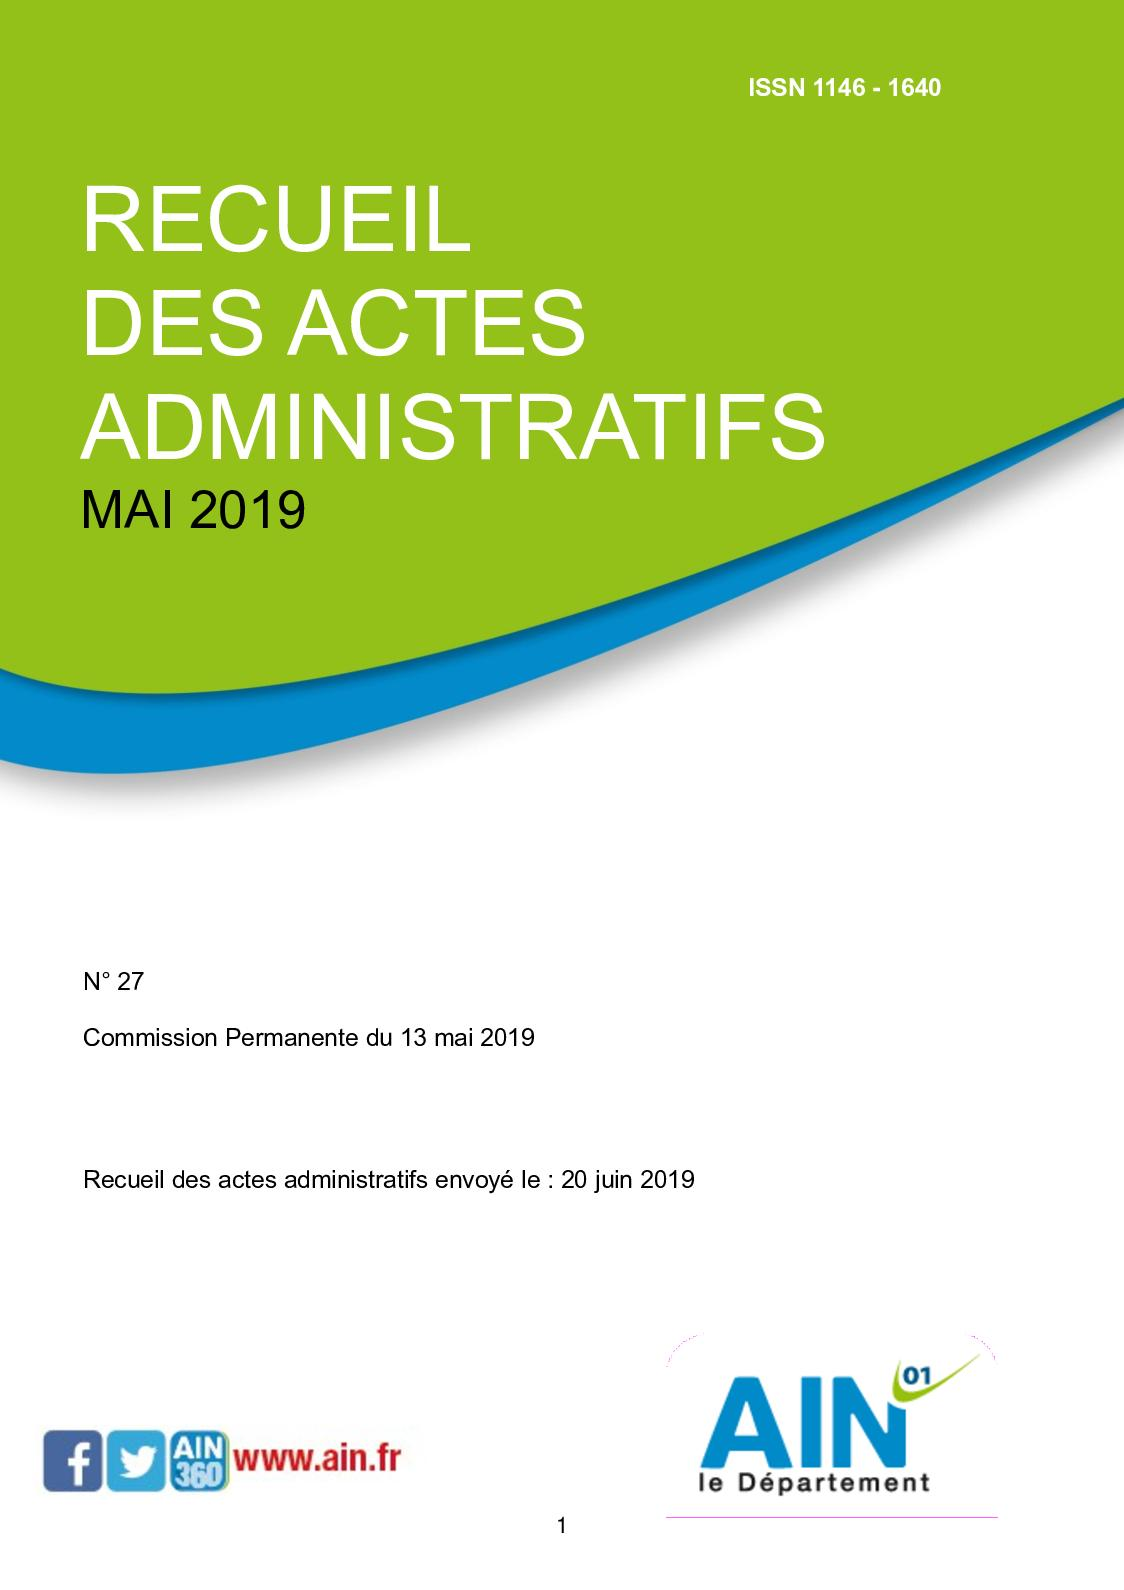 Seda Recueil Calaméo Administratifs Actes Cp052019 nw8POk0